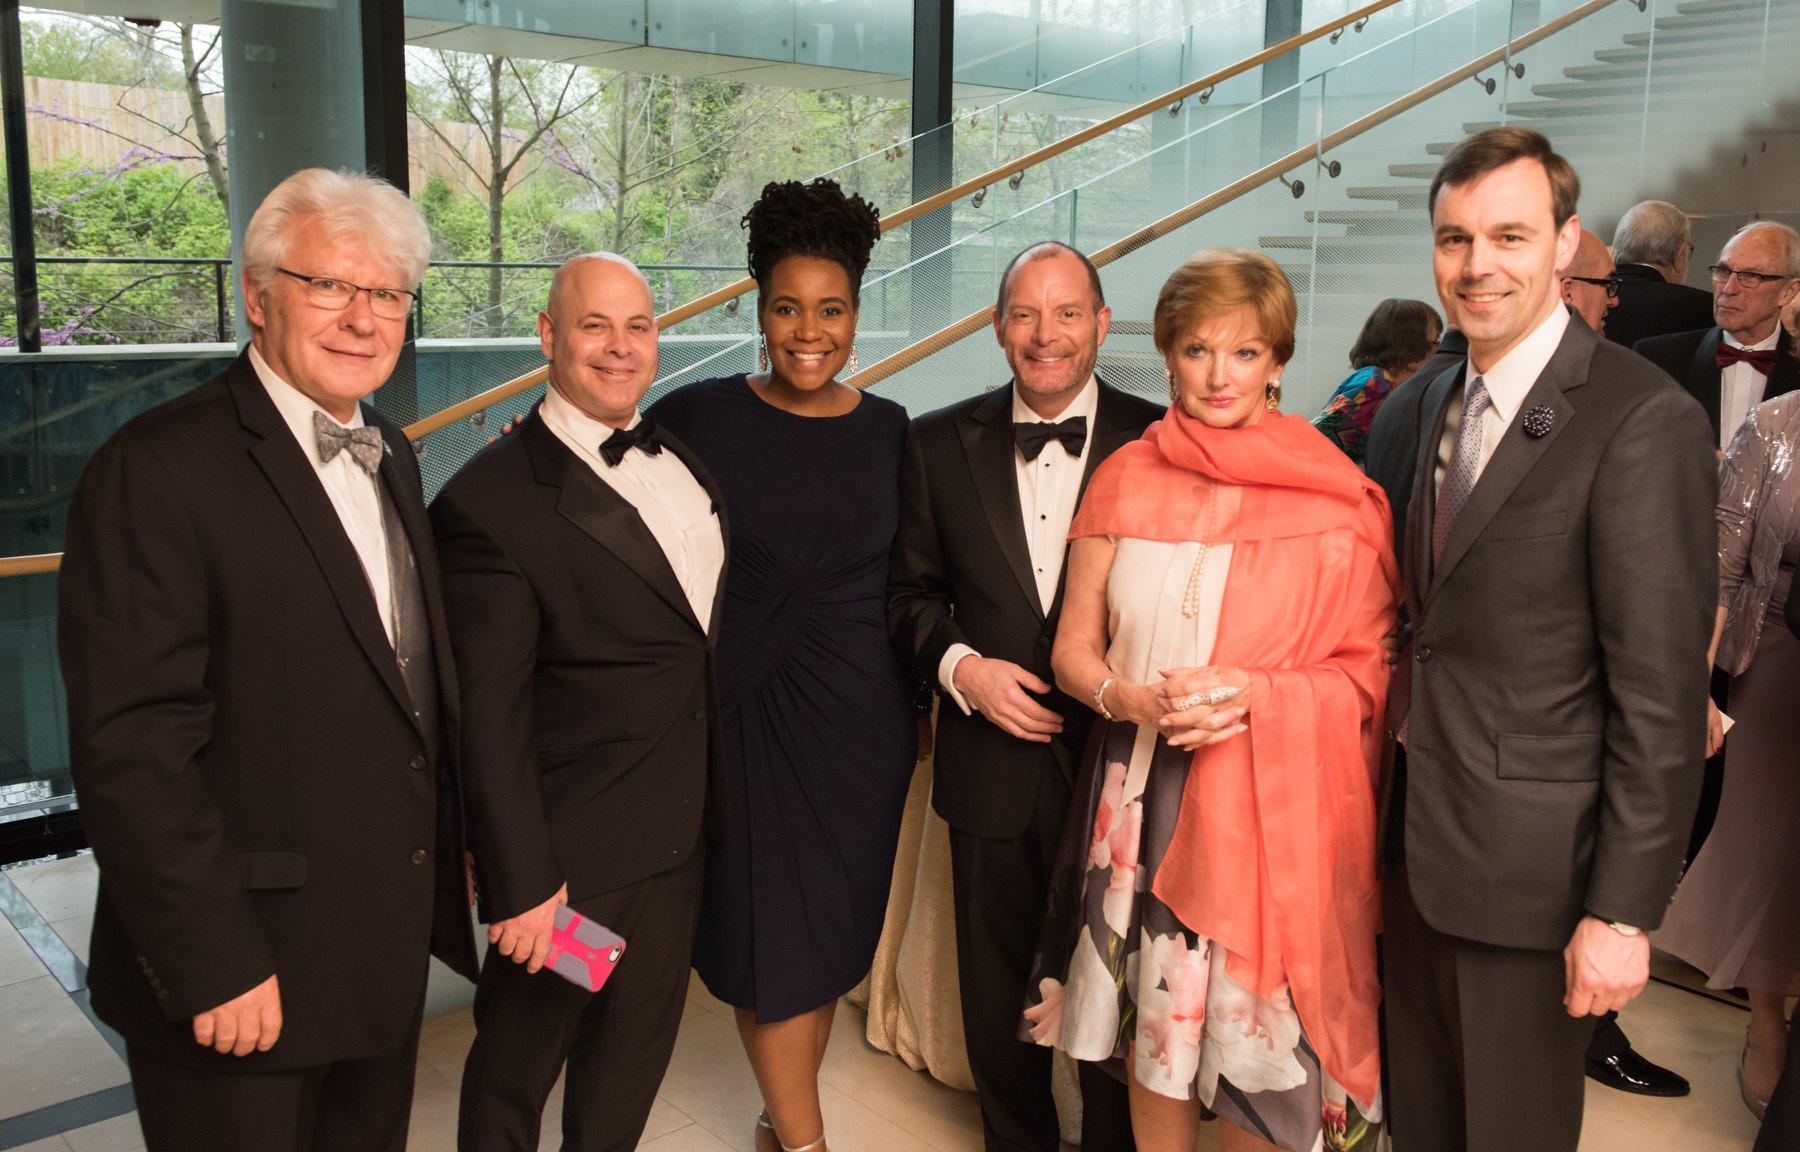 Stefan Fedor with Lee Cohan, Kristal Hartsfield, Craig Engle, Amanda Bowman and Chad Kilbourne of the Magyar Foundation